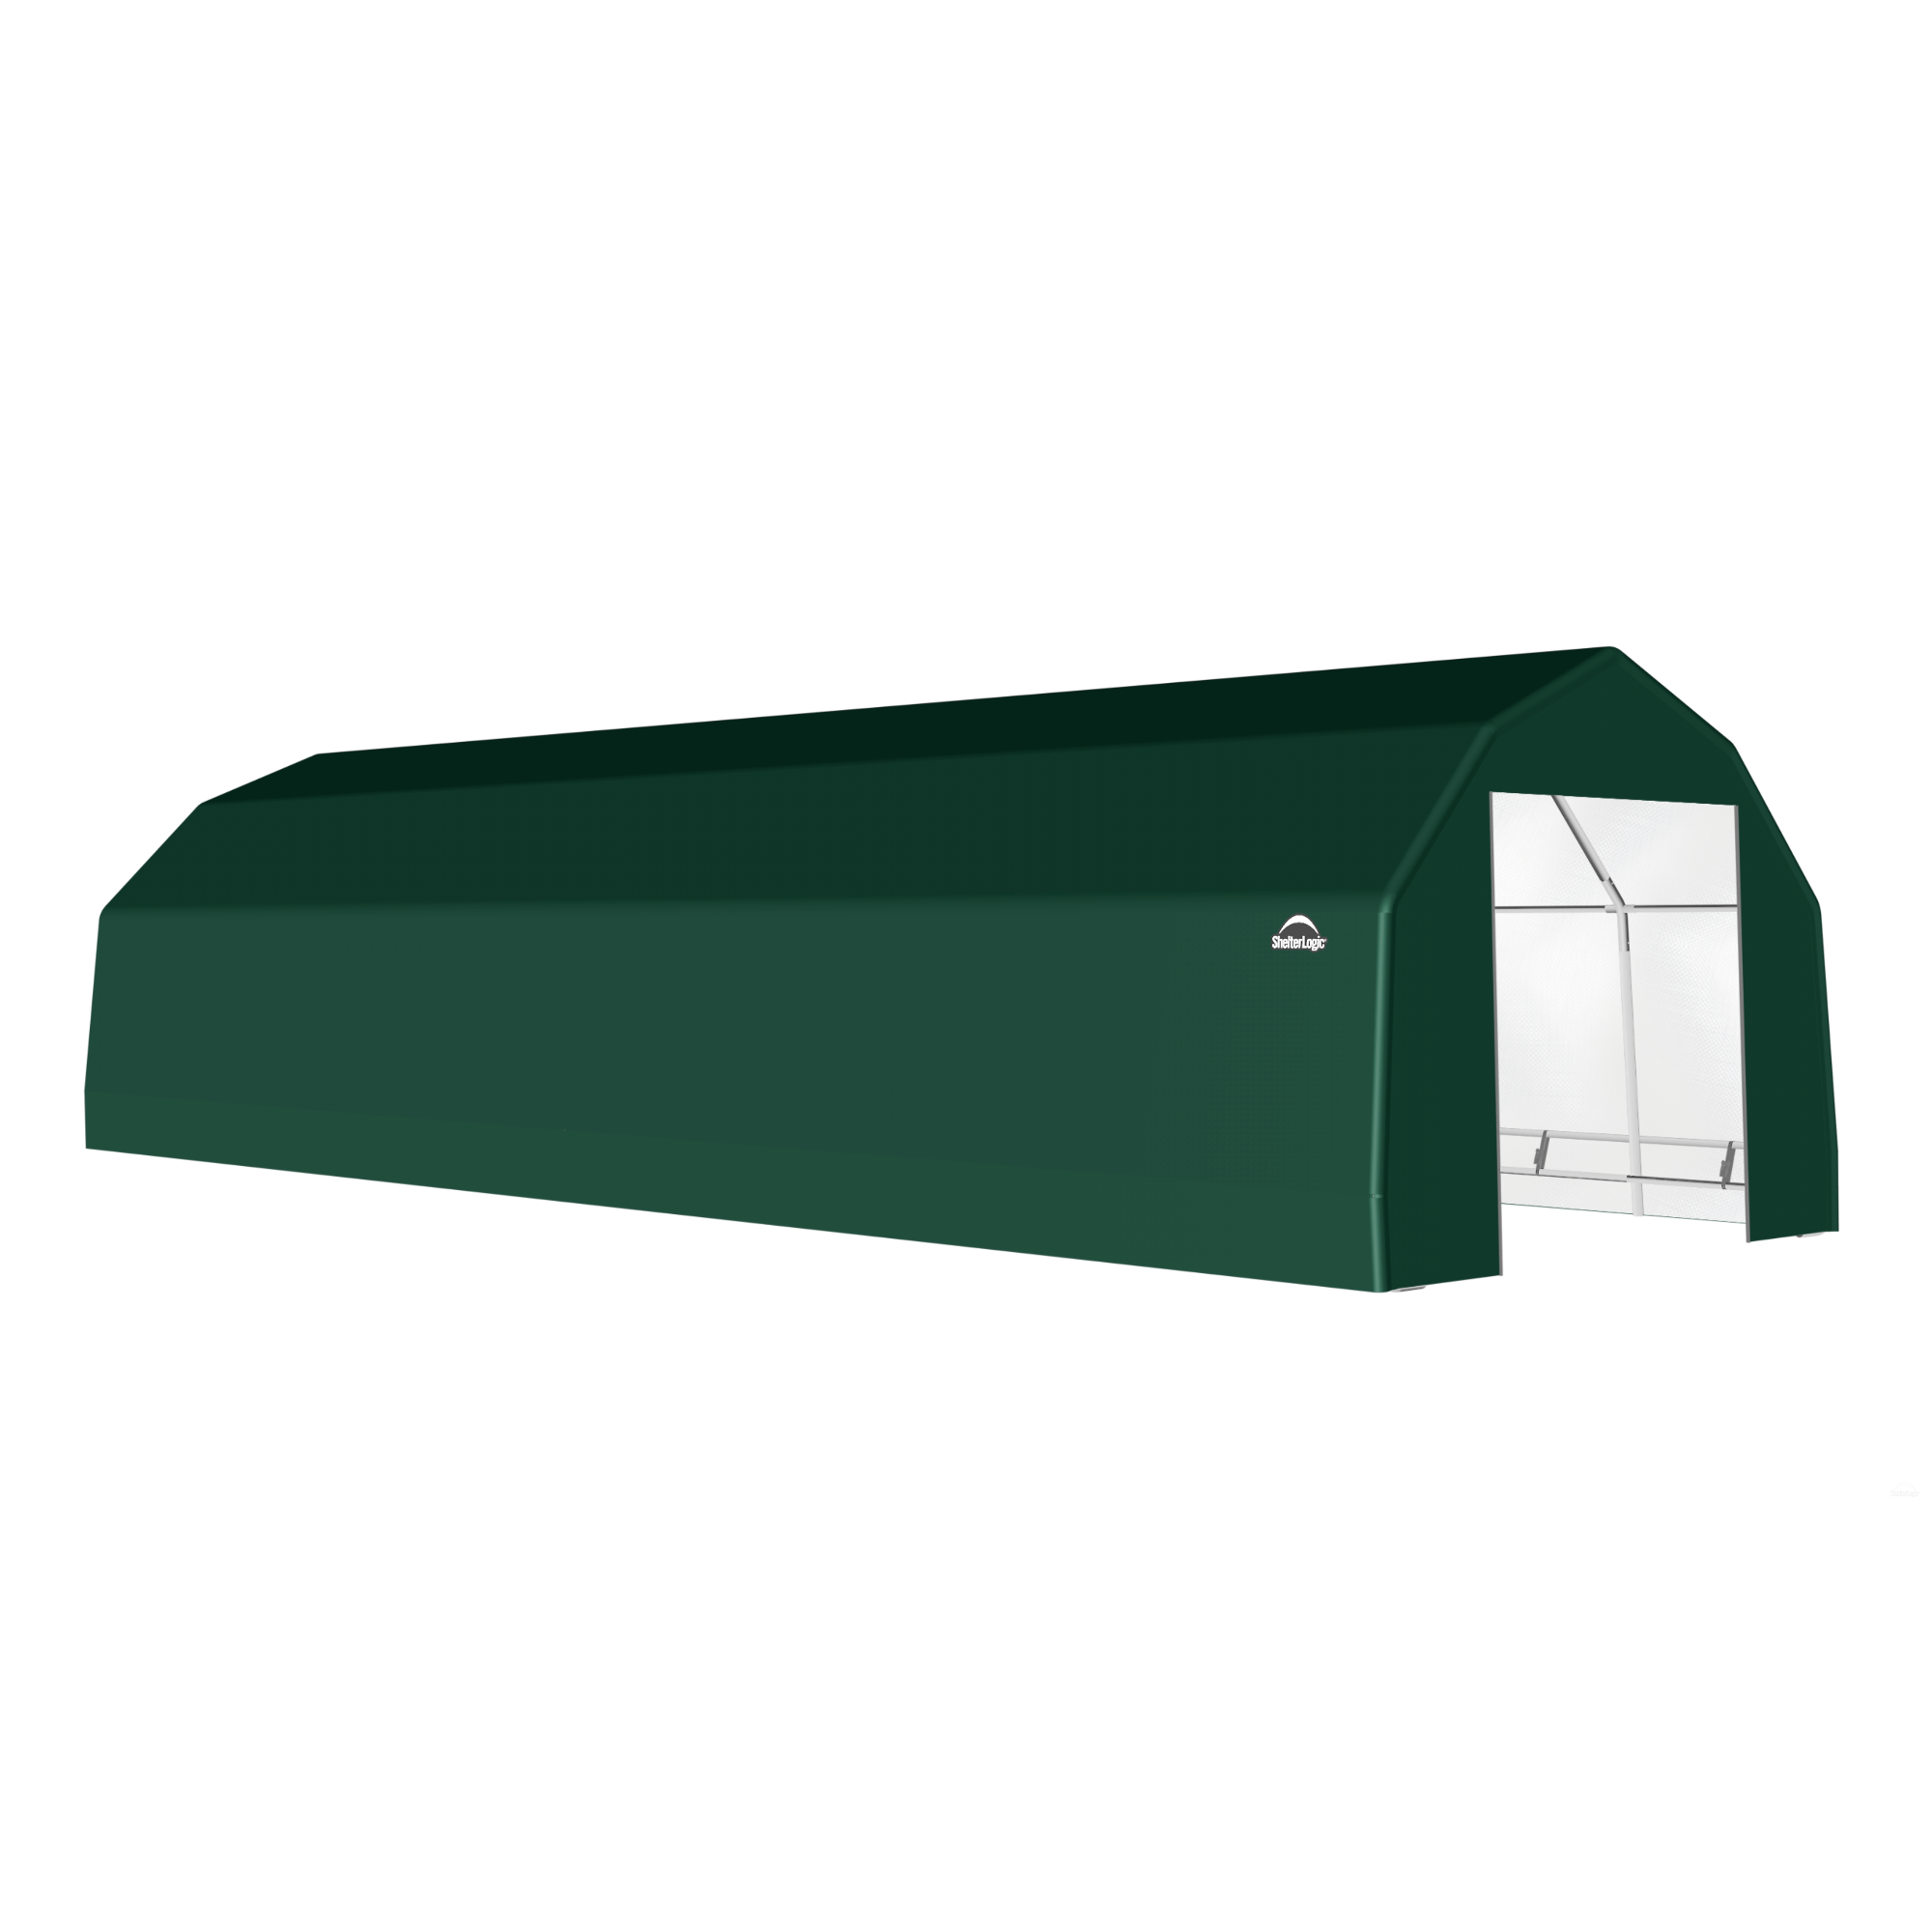 SP Barn 15X32X11 Green 14 oz PE Shelter